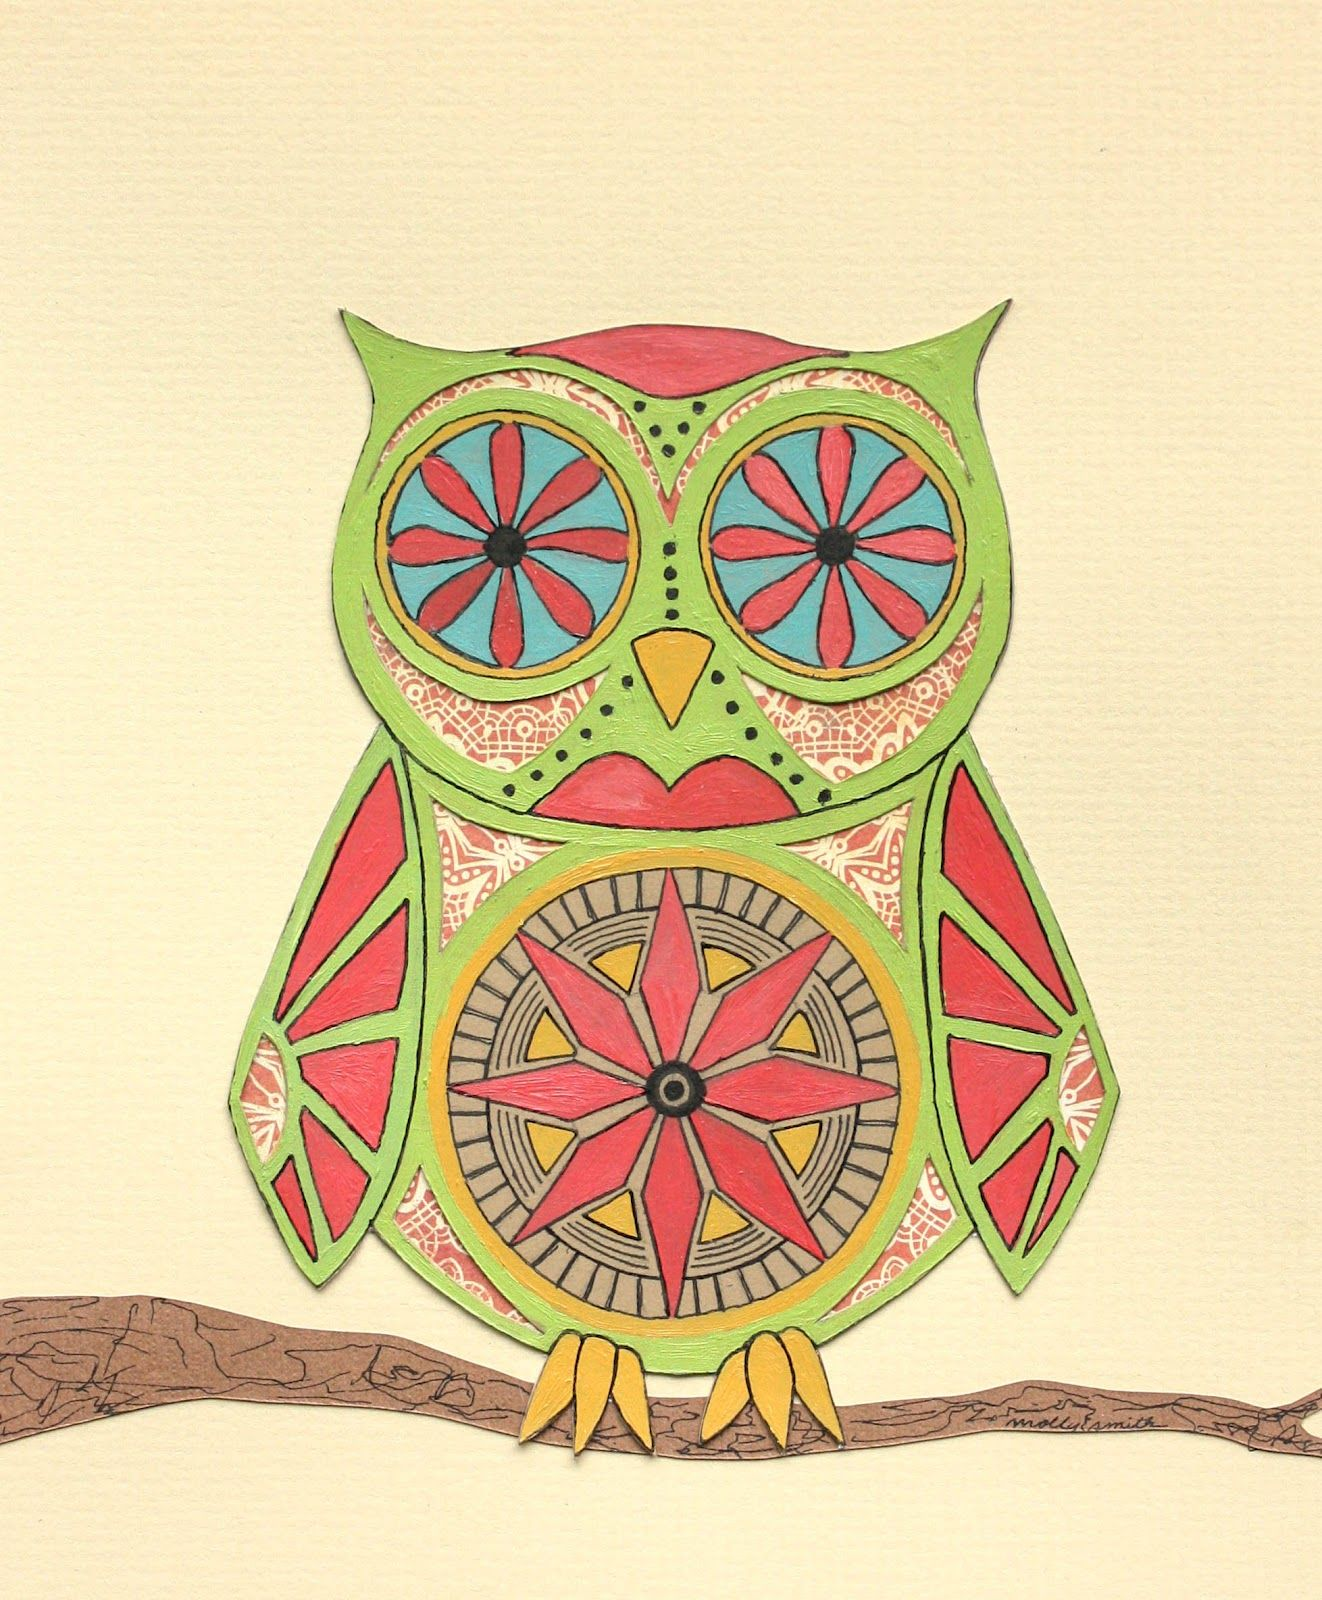 Owl Sugar Skull Drawing - photo#32